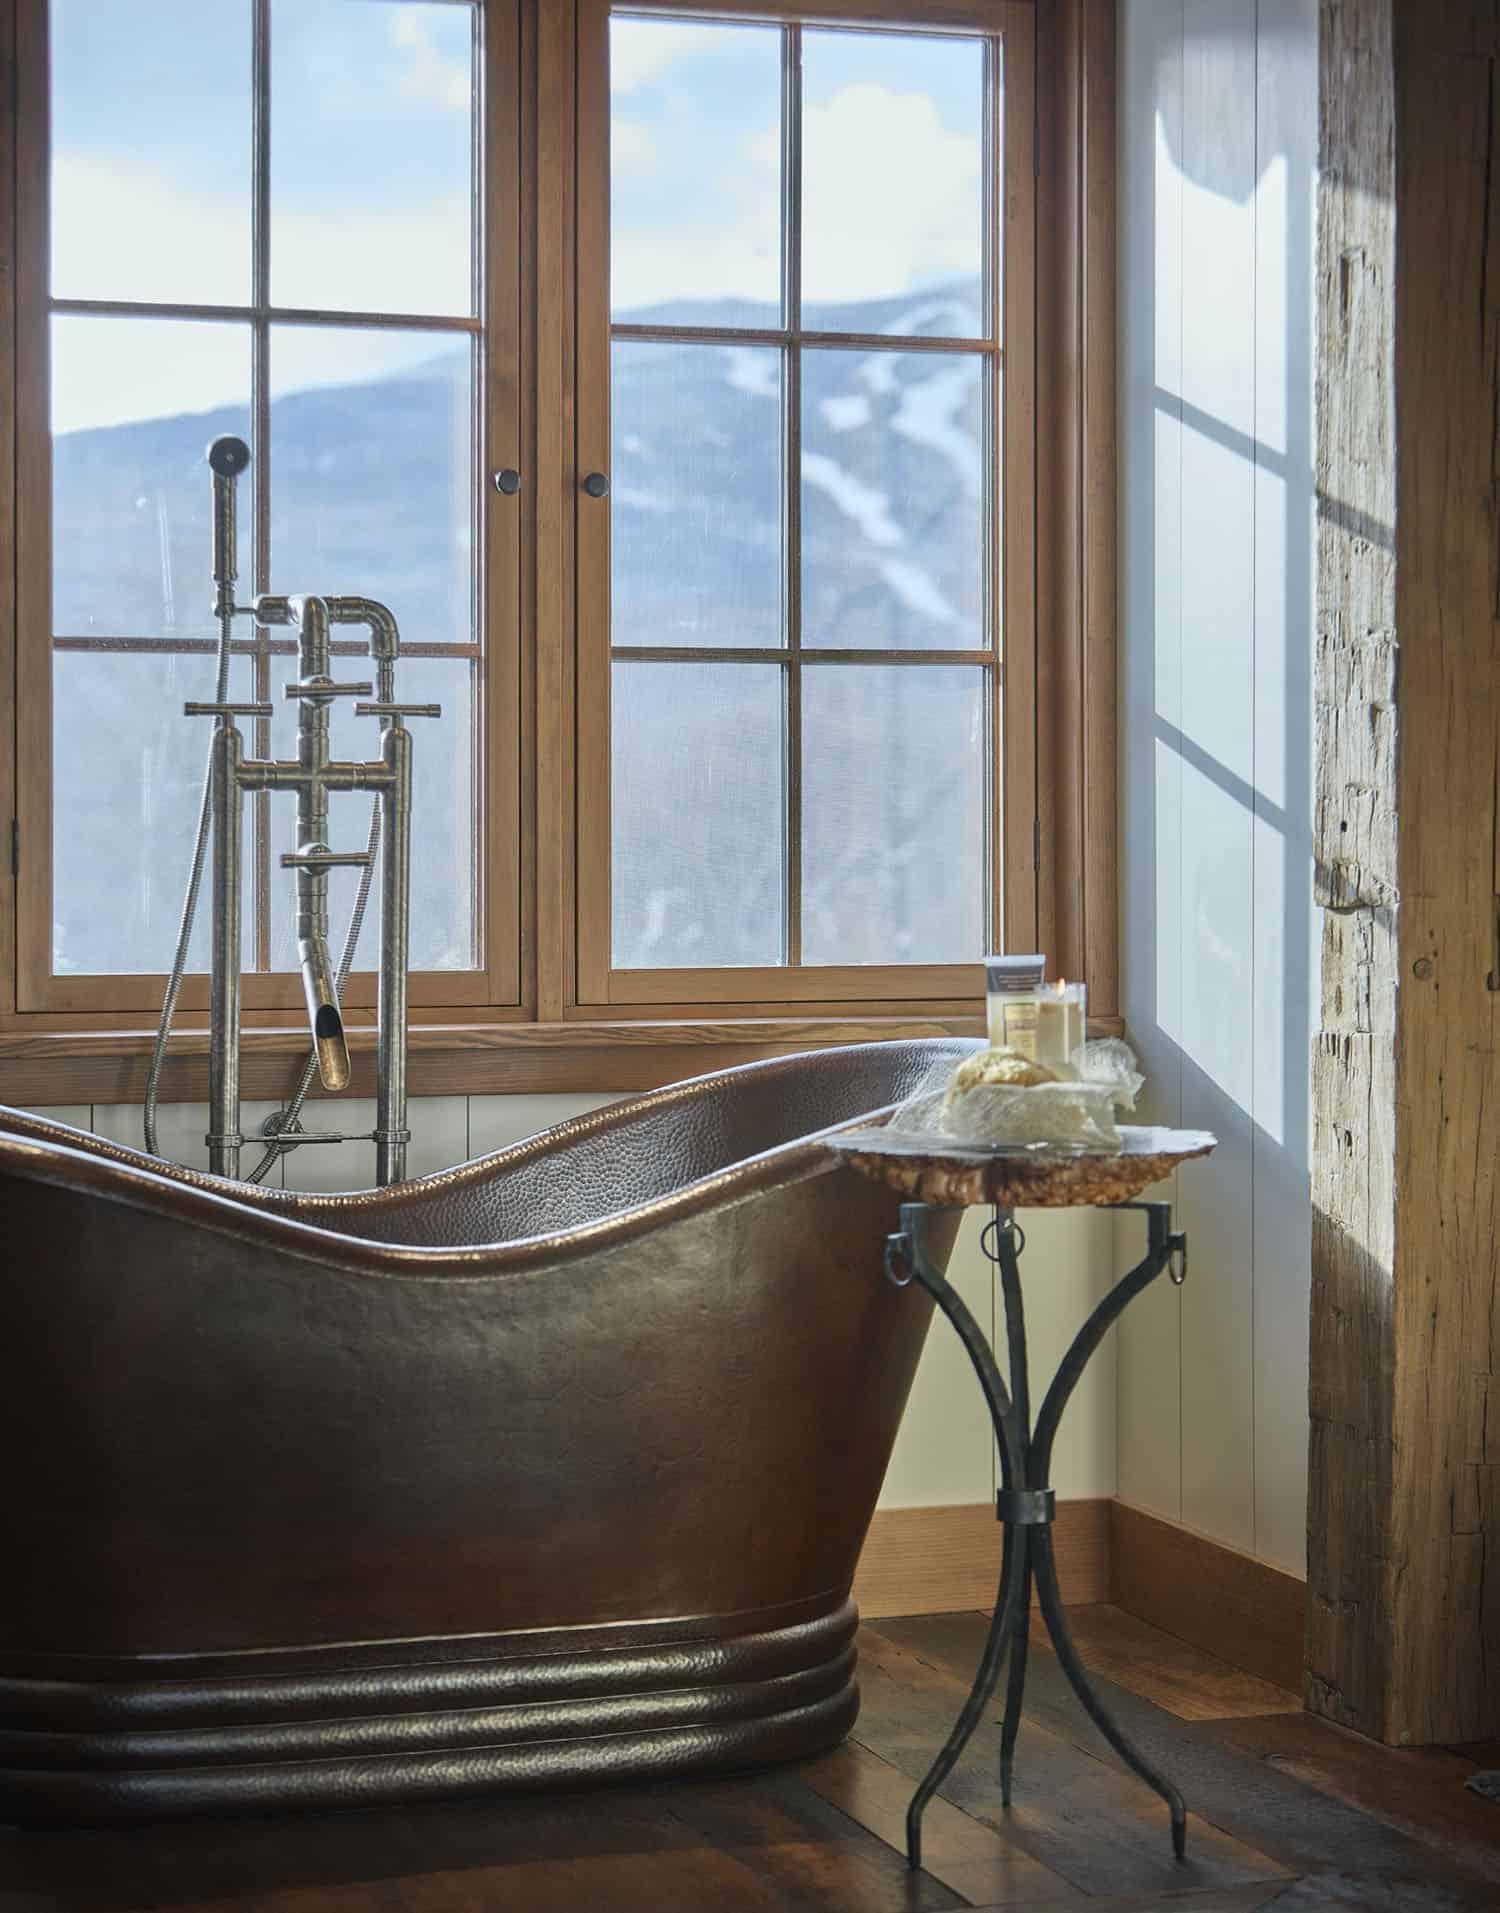 salle de bain-rustique-principale-baignoire-cuivre